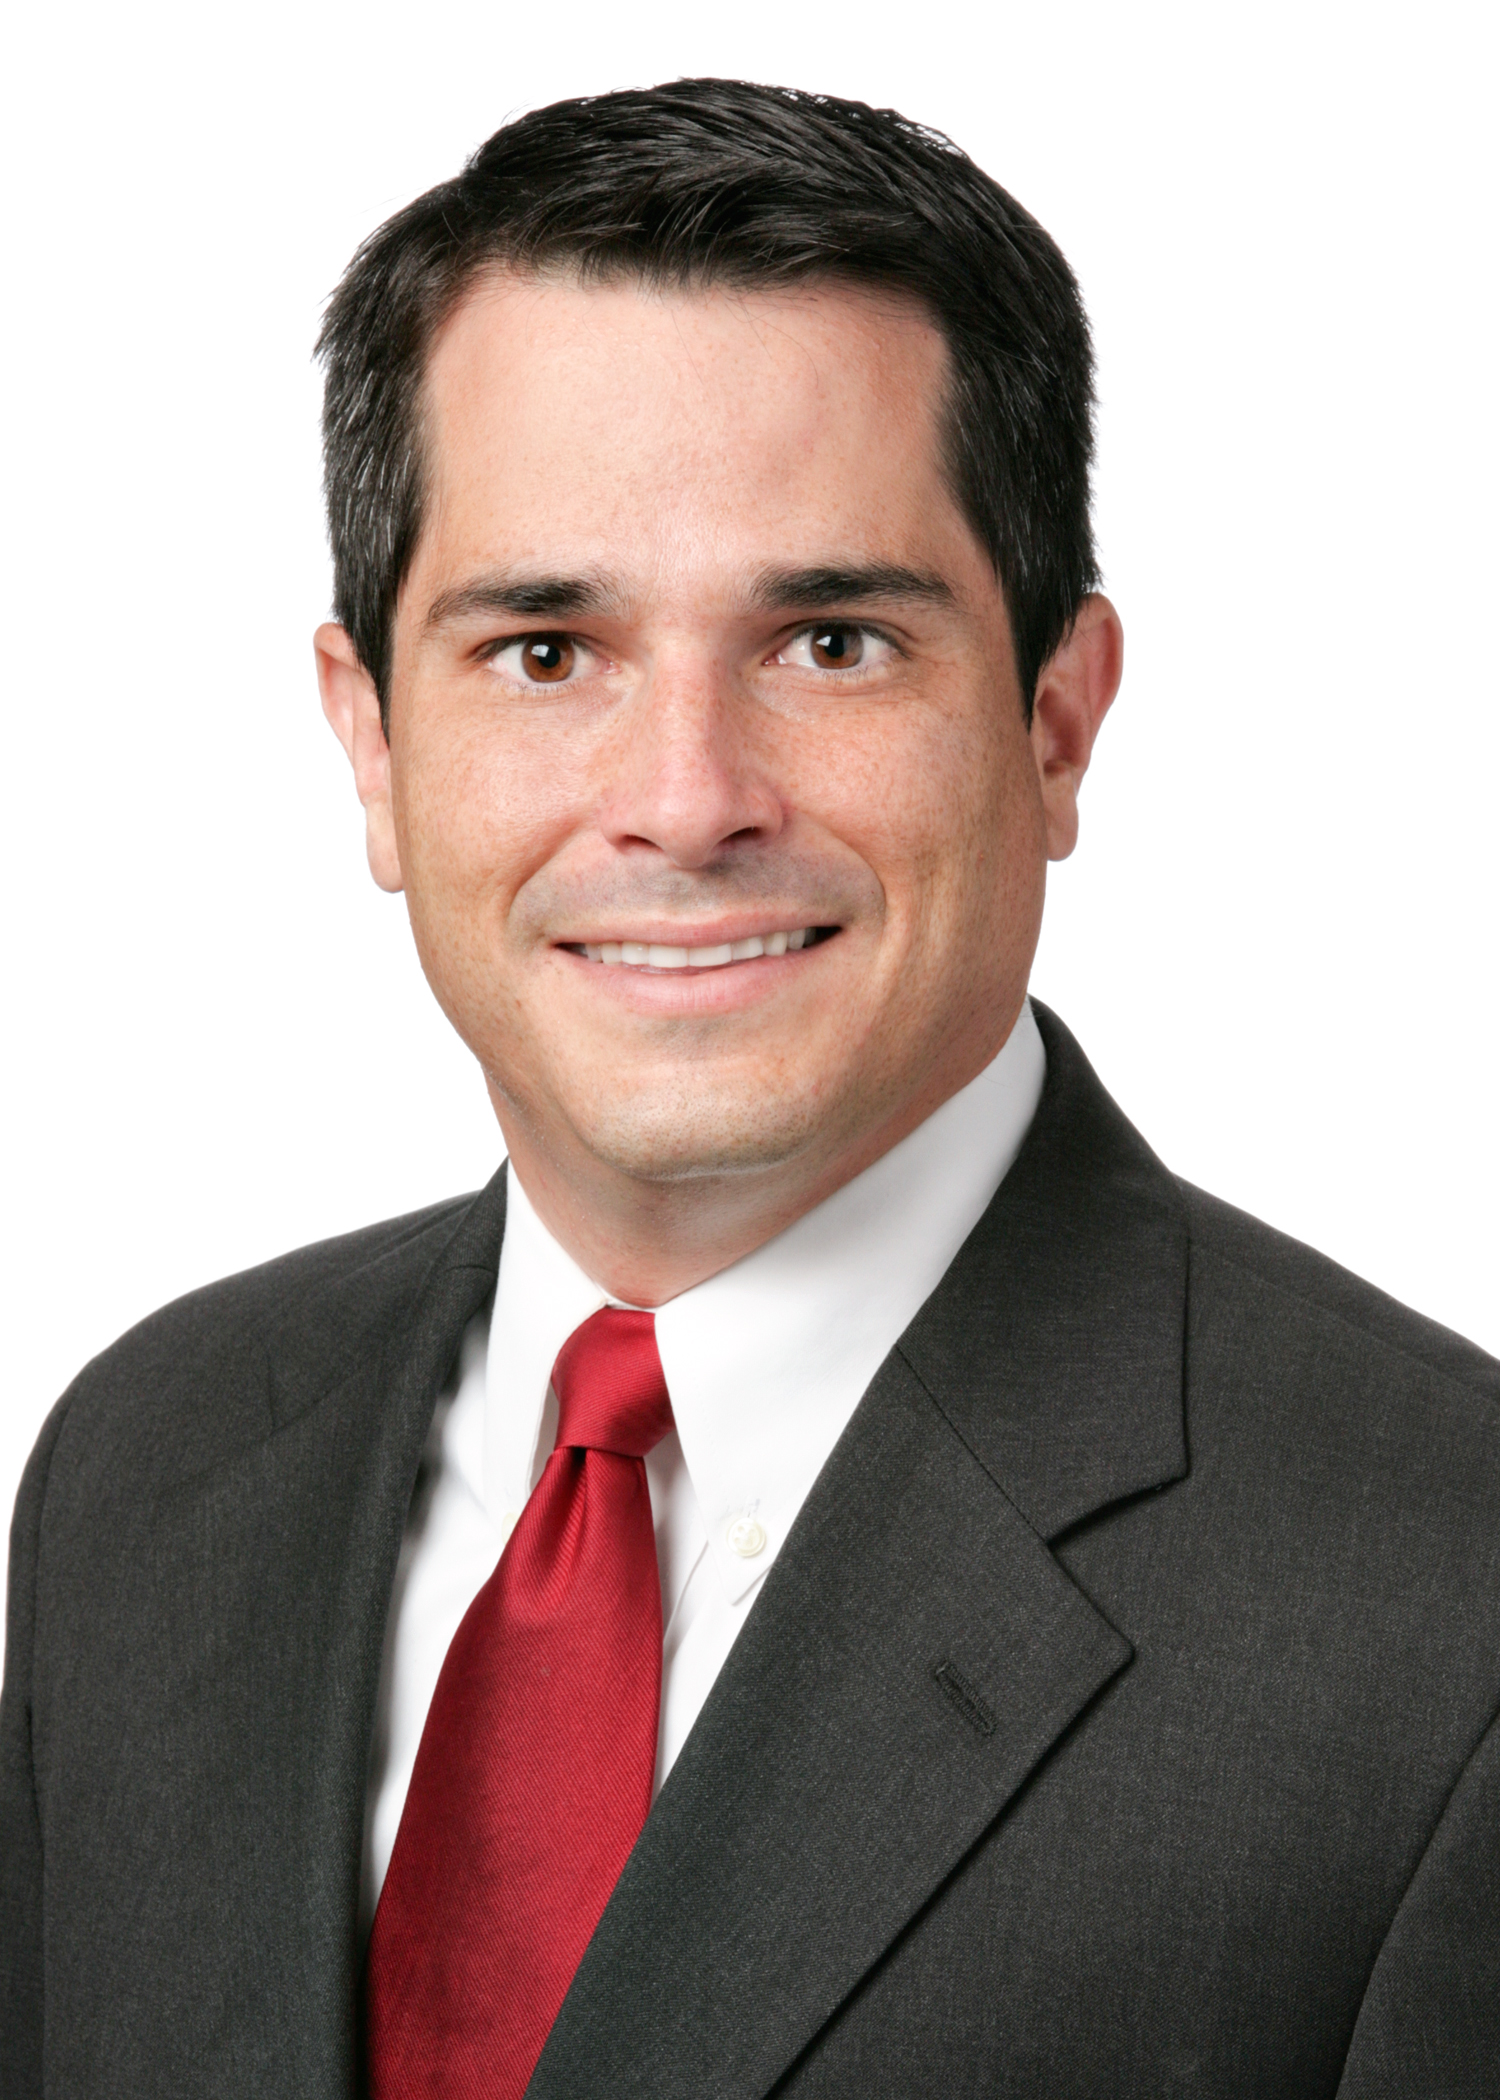 Christian Moreno